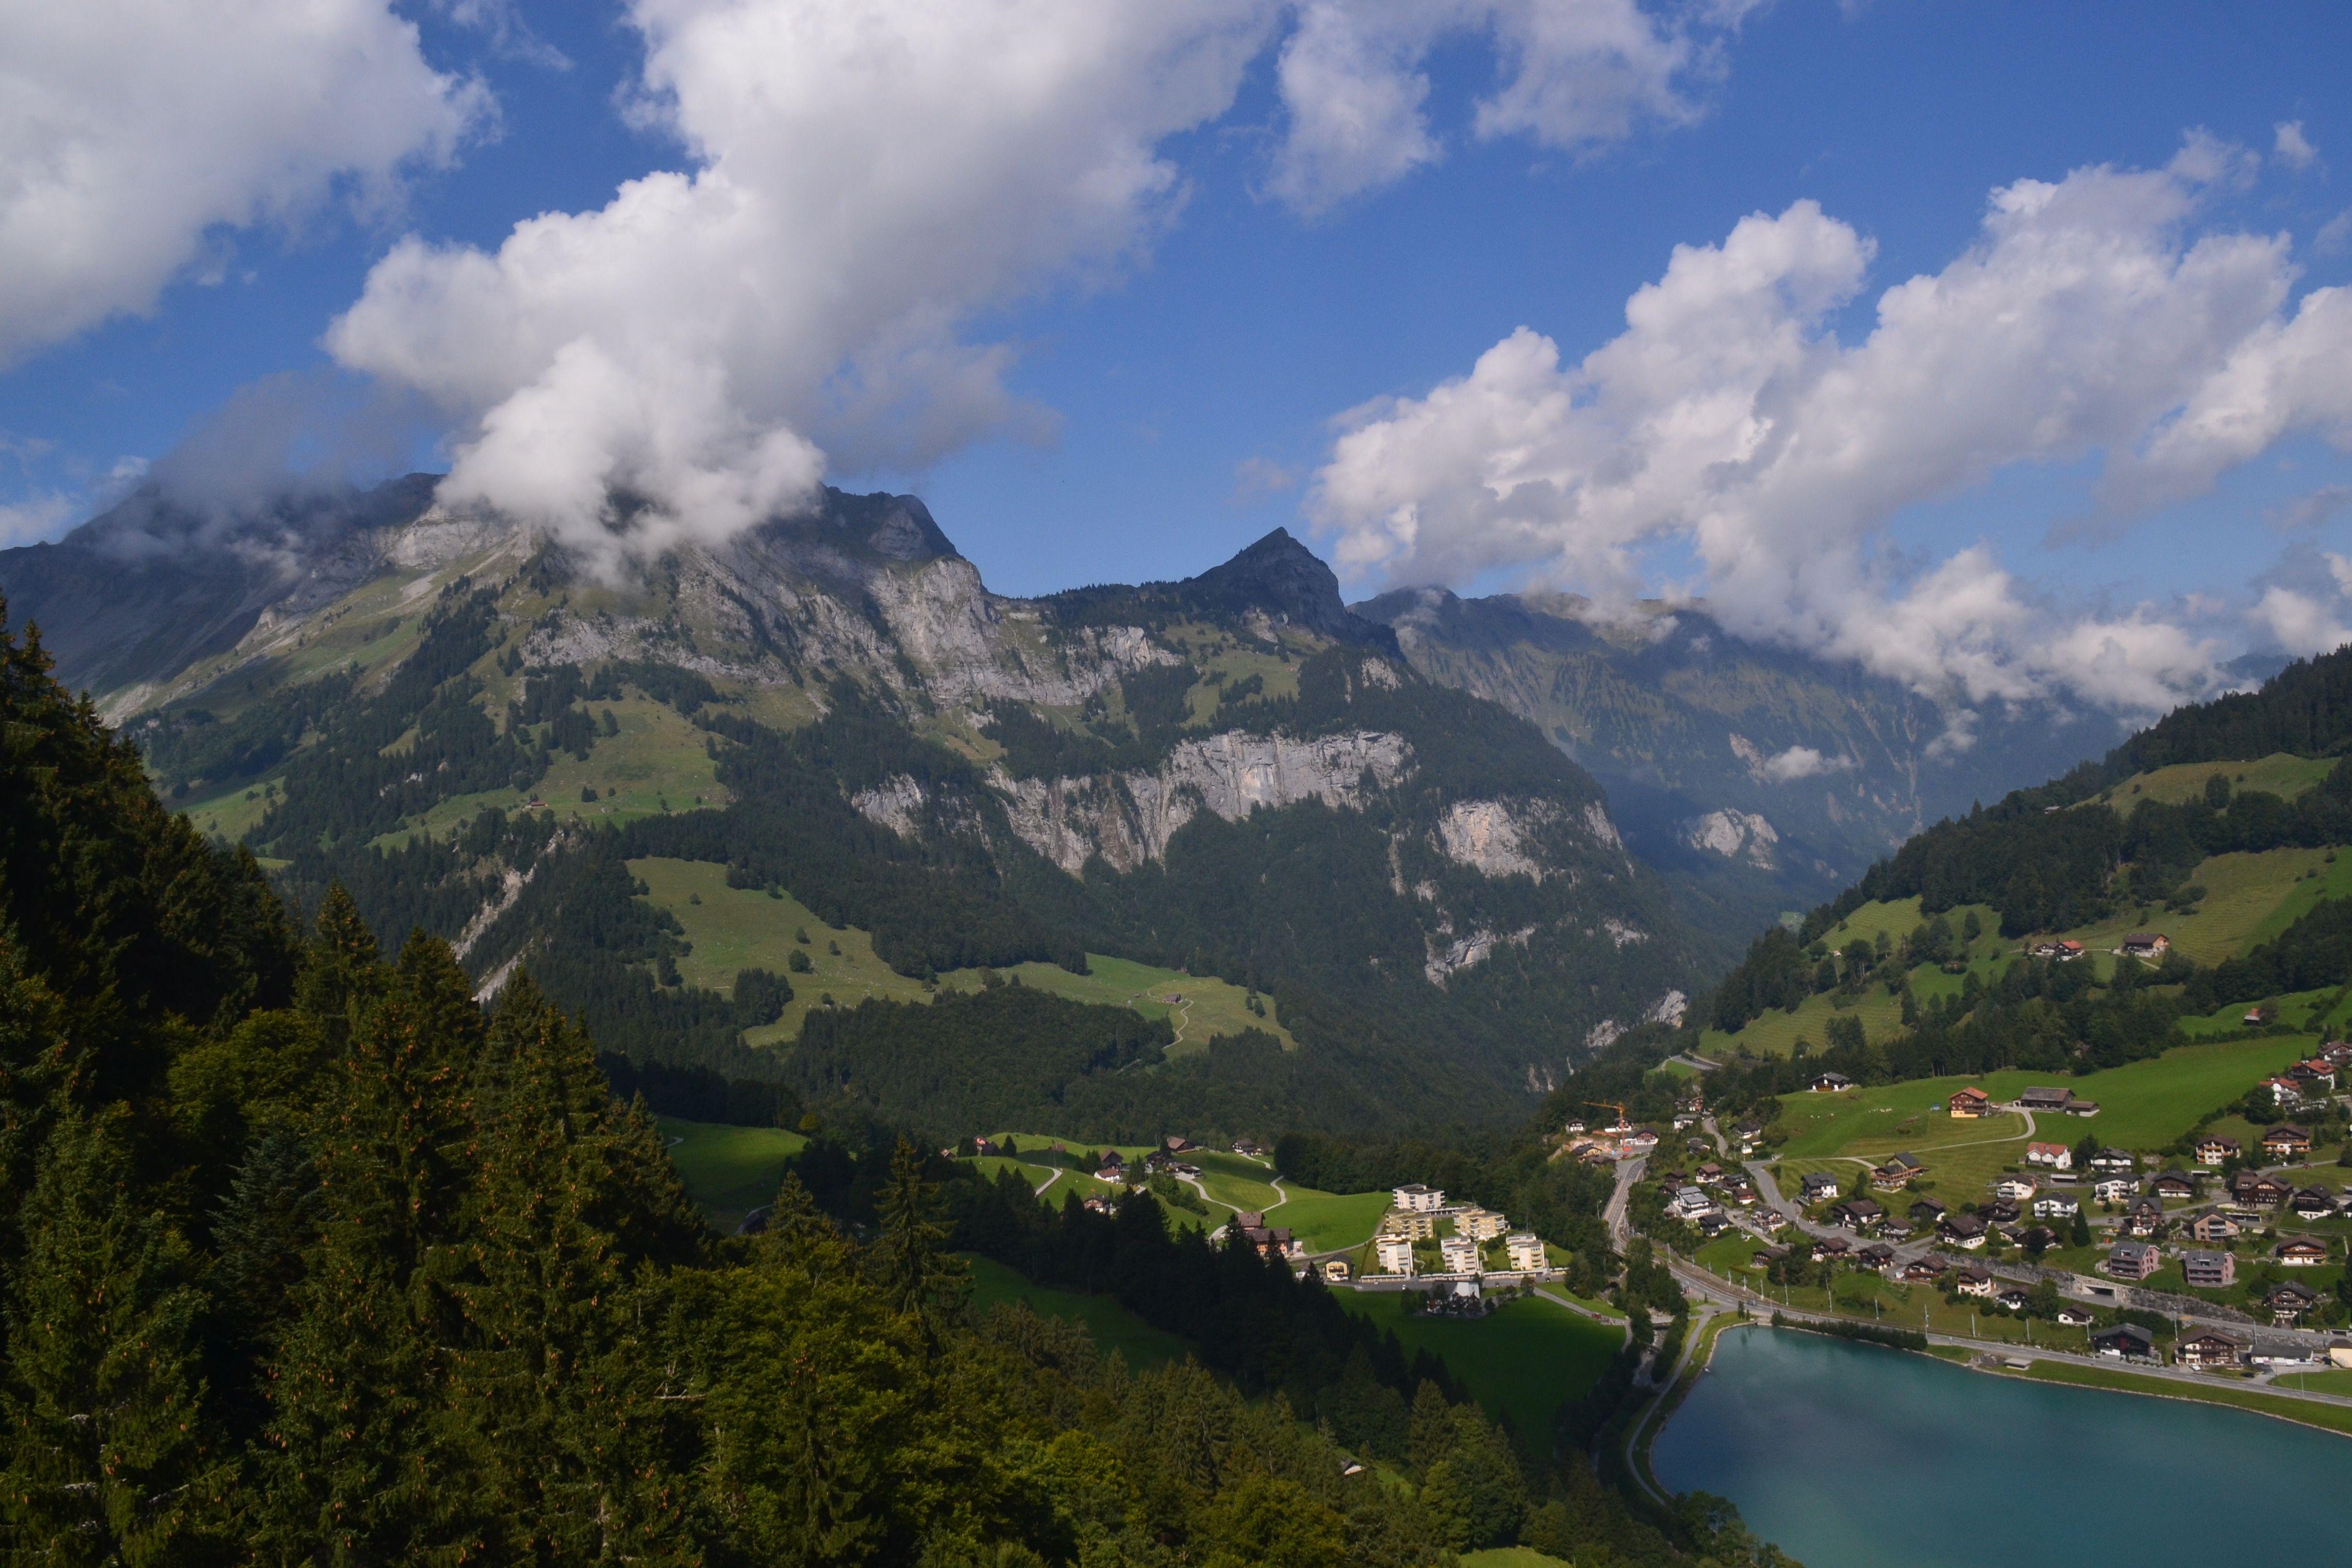 View from Mt. Titlis Switzerland